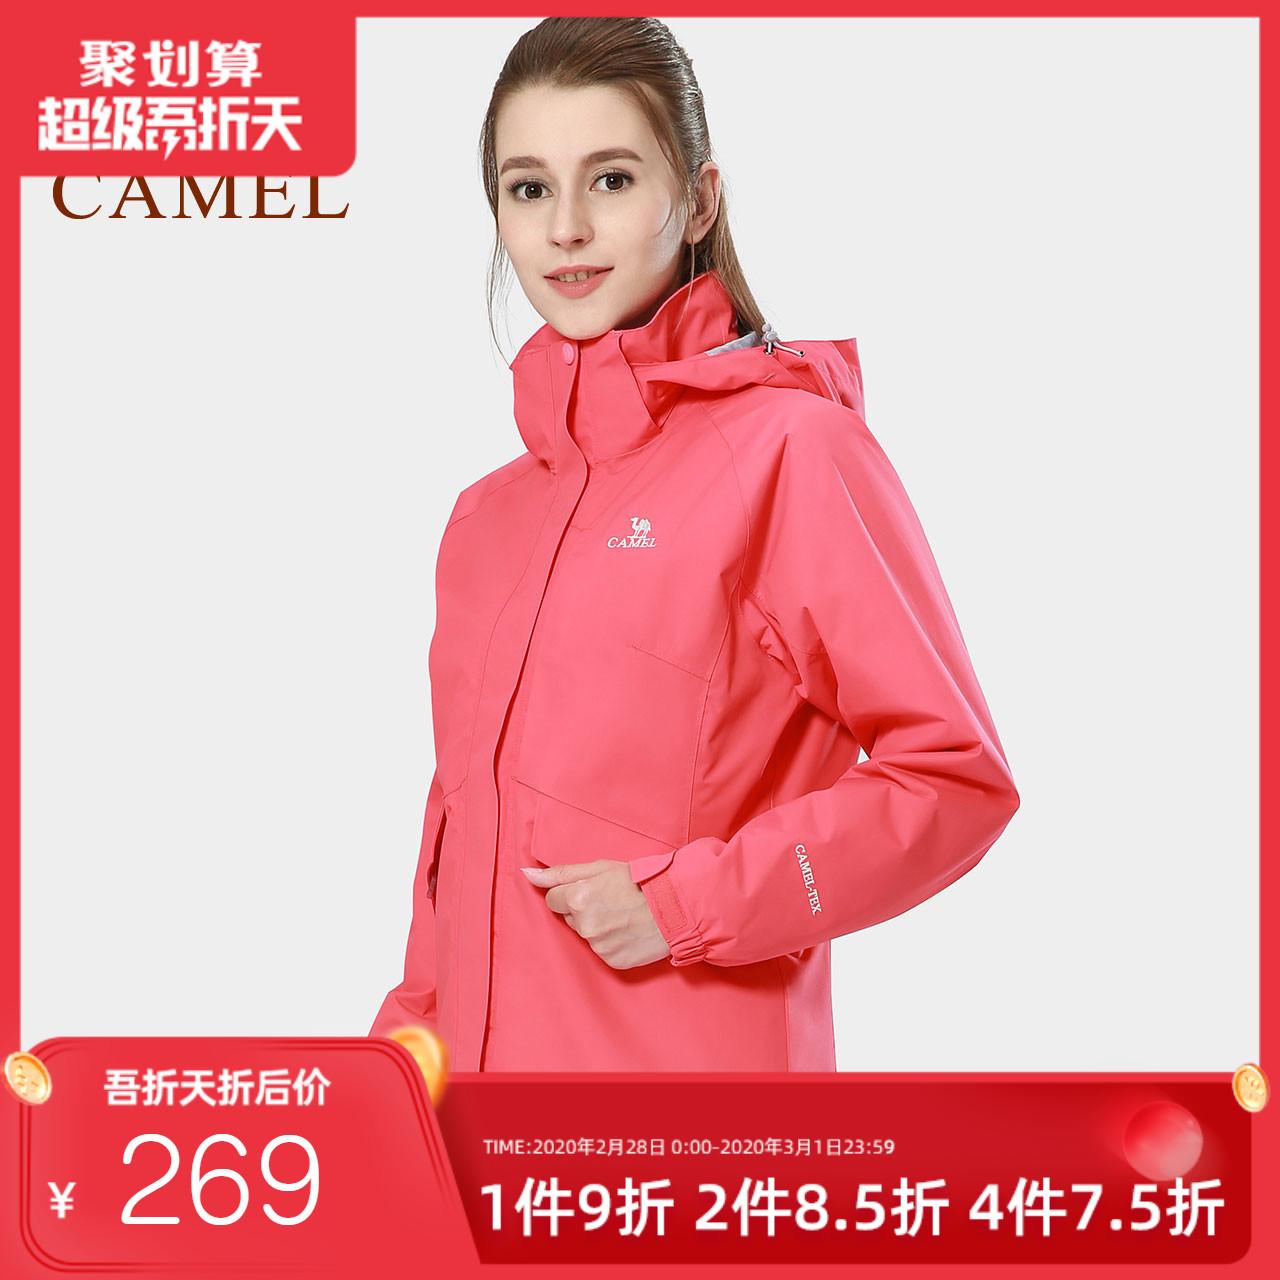 CAMEL骆驼户外女款冲锋衣 内胆抗起球防静电冲锋衣女 登山服